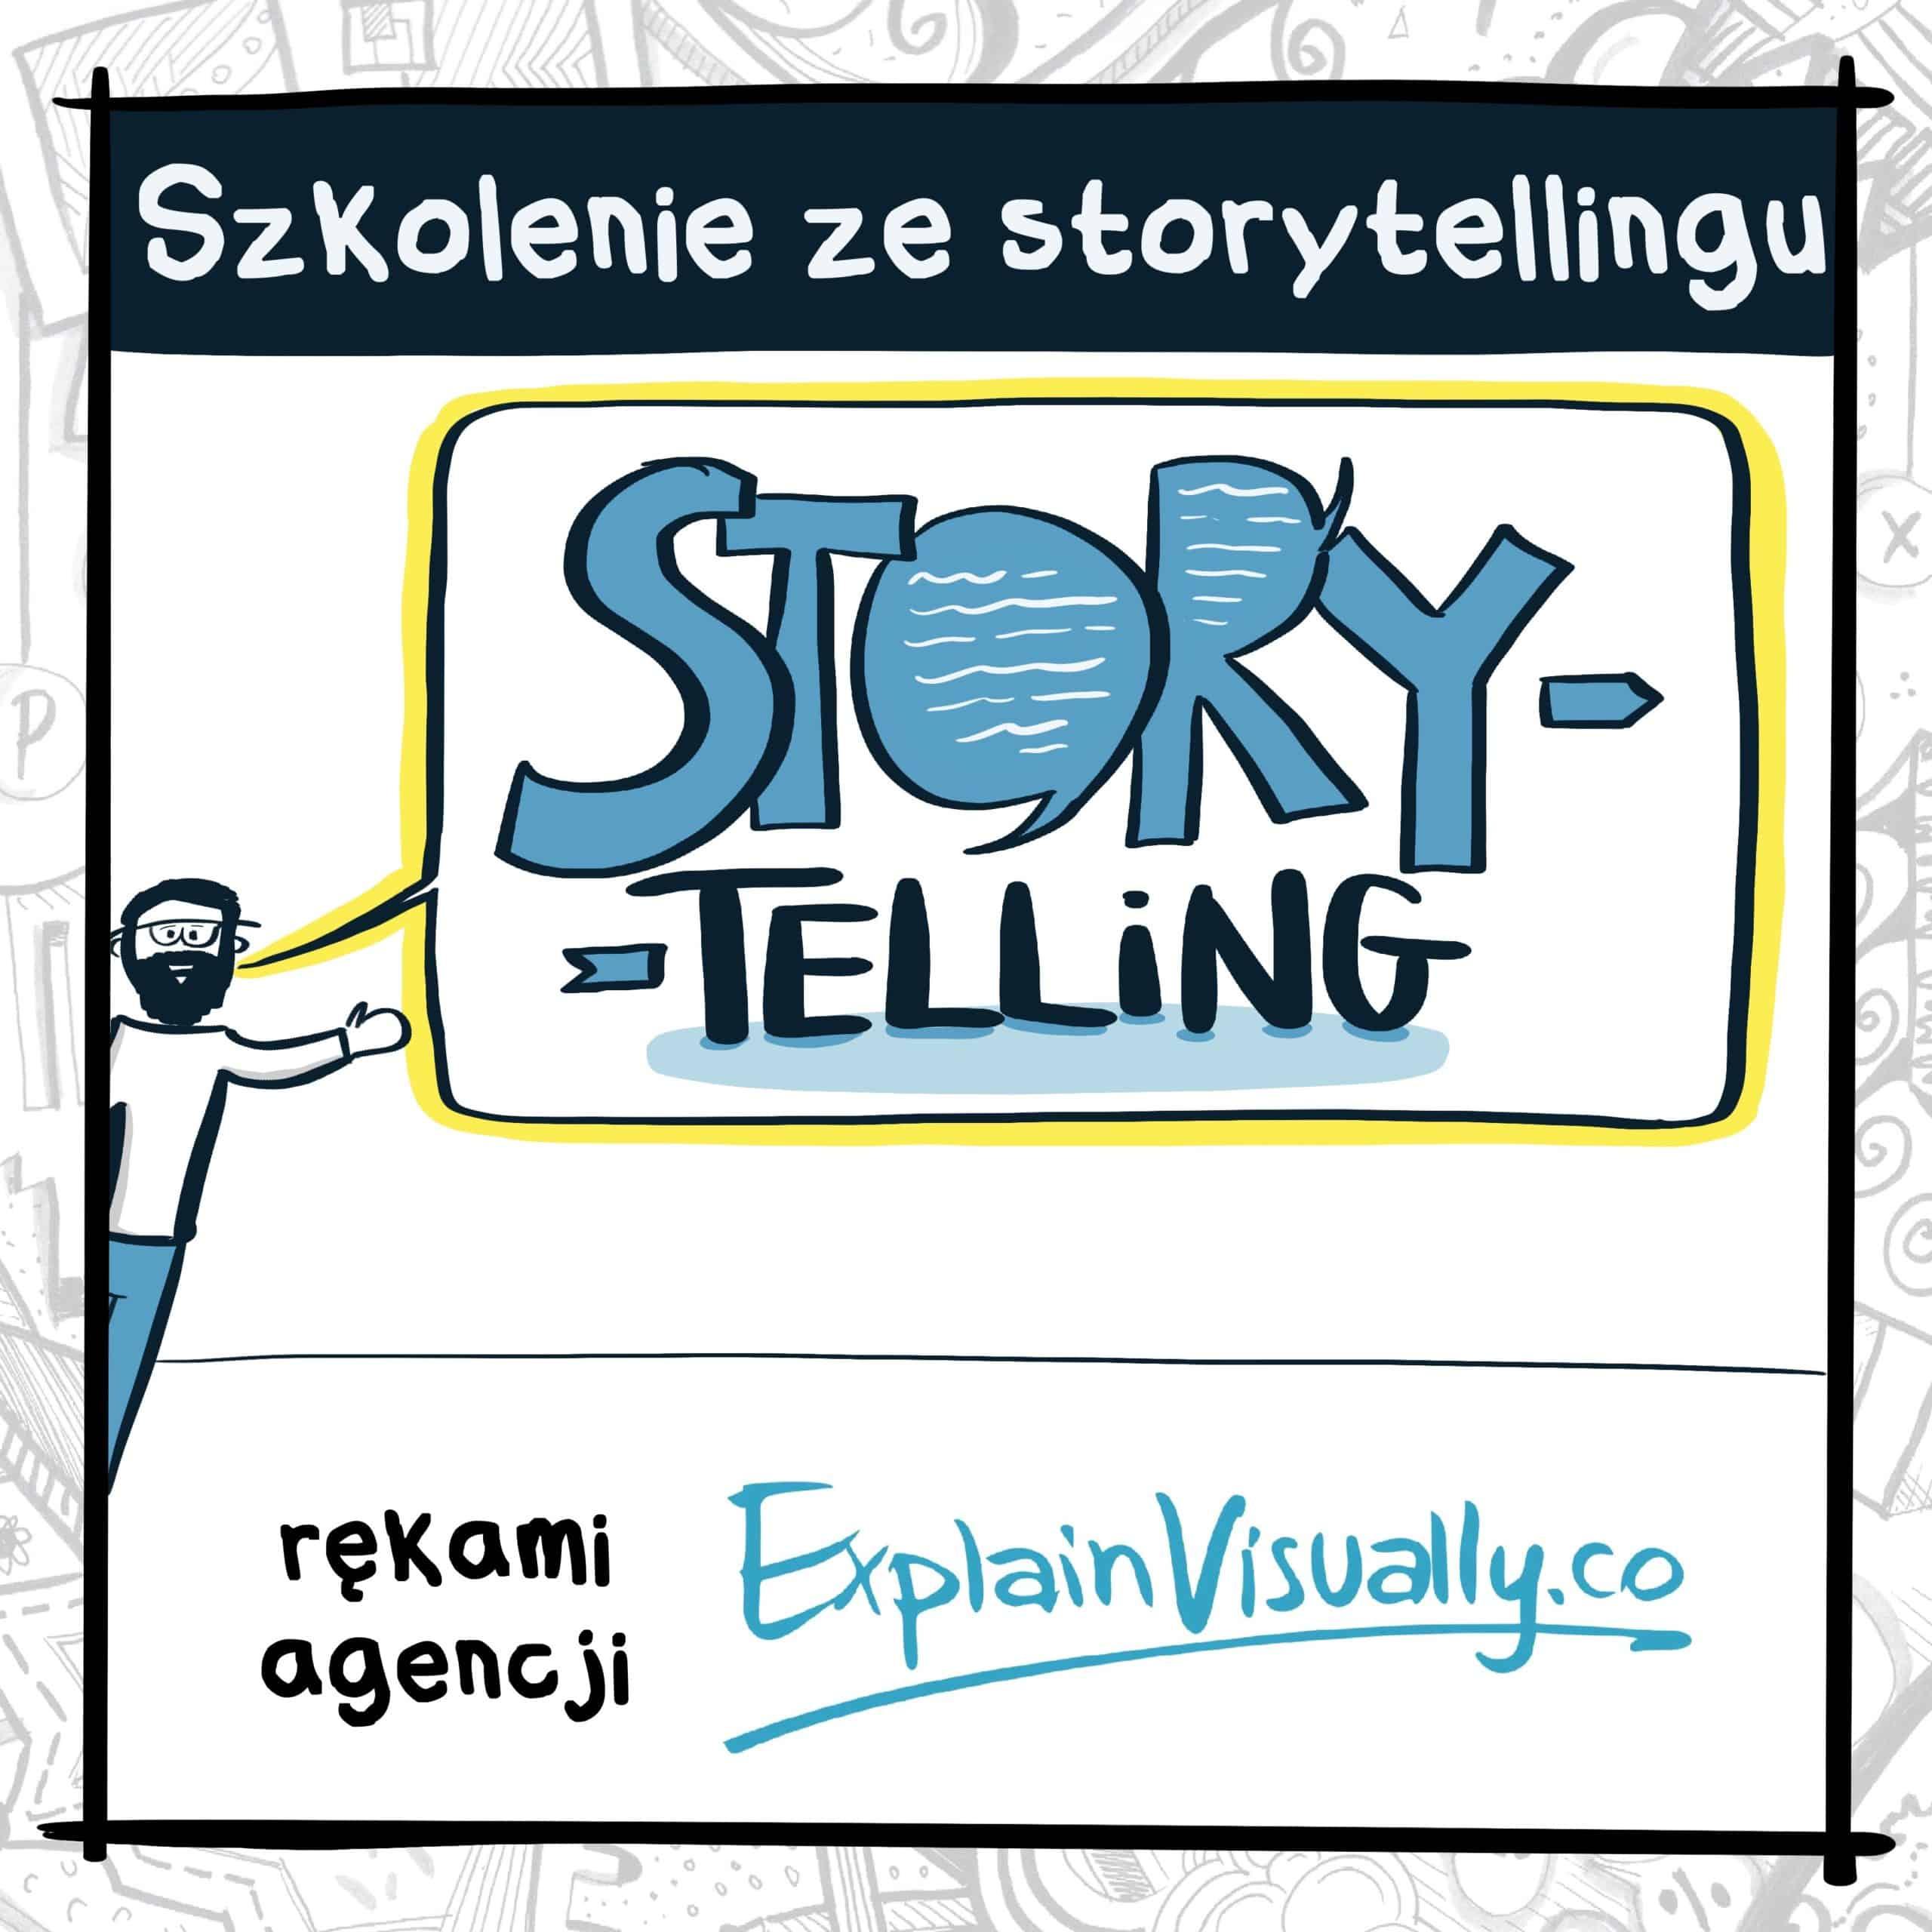 ikonka do sklepu EV szkolenie ze storytellingu